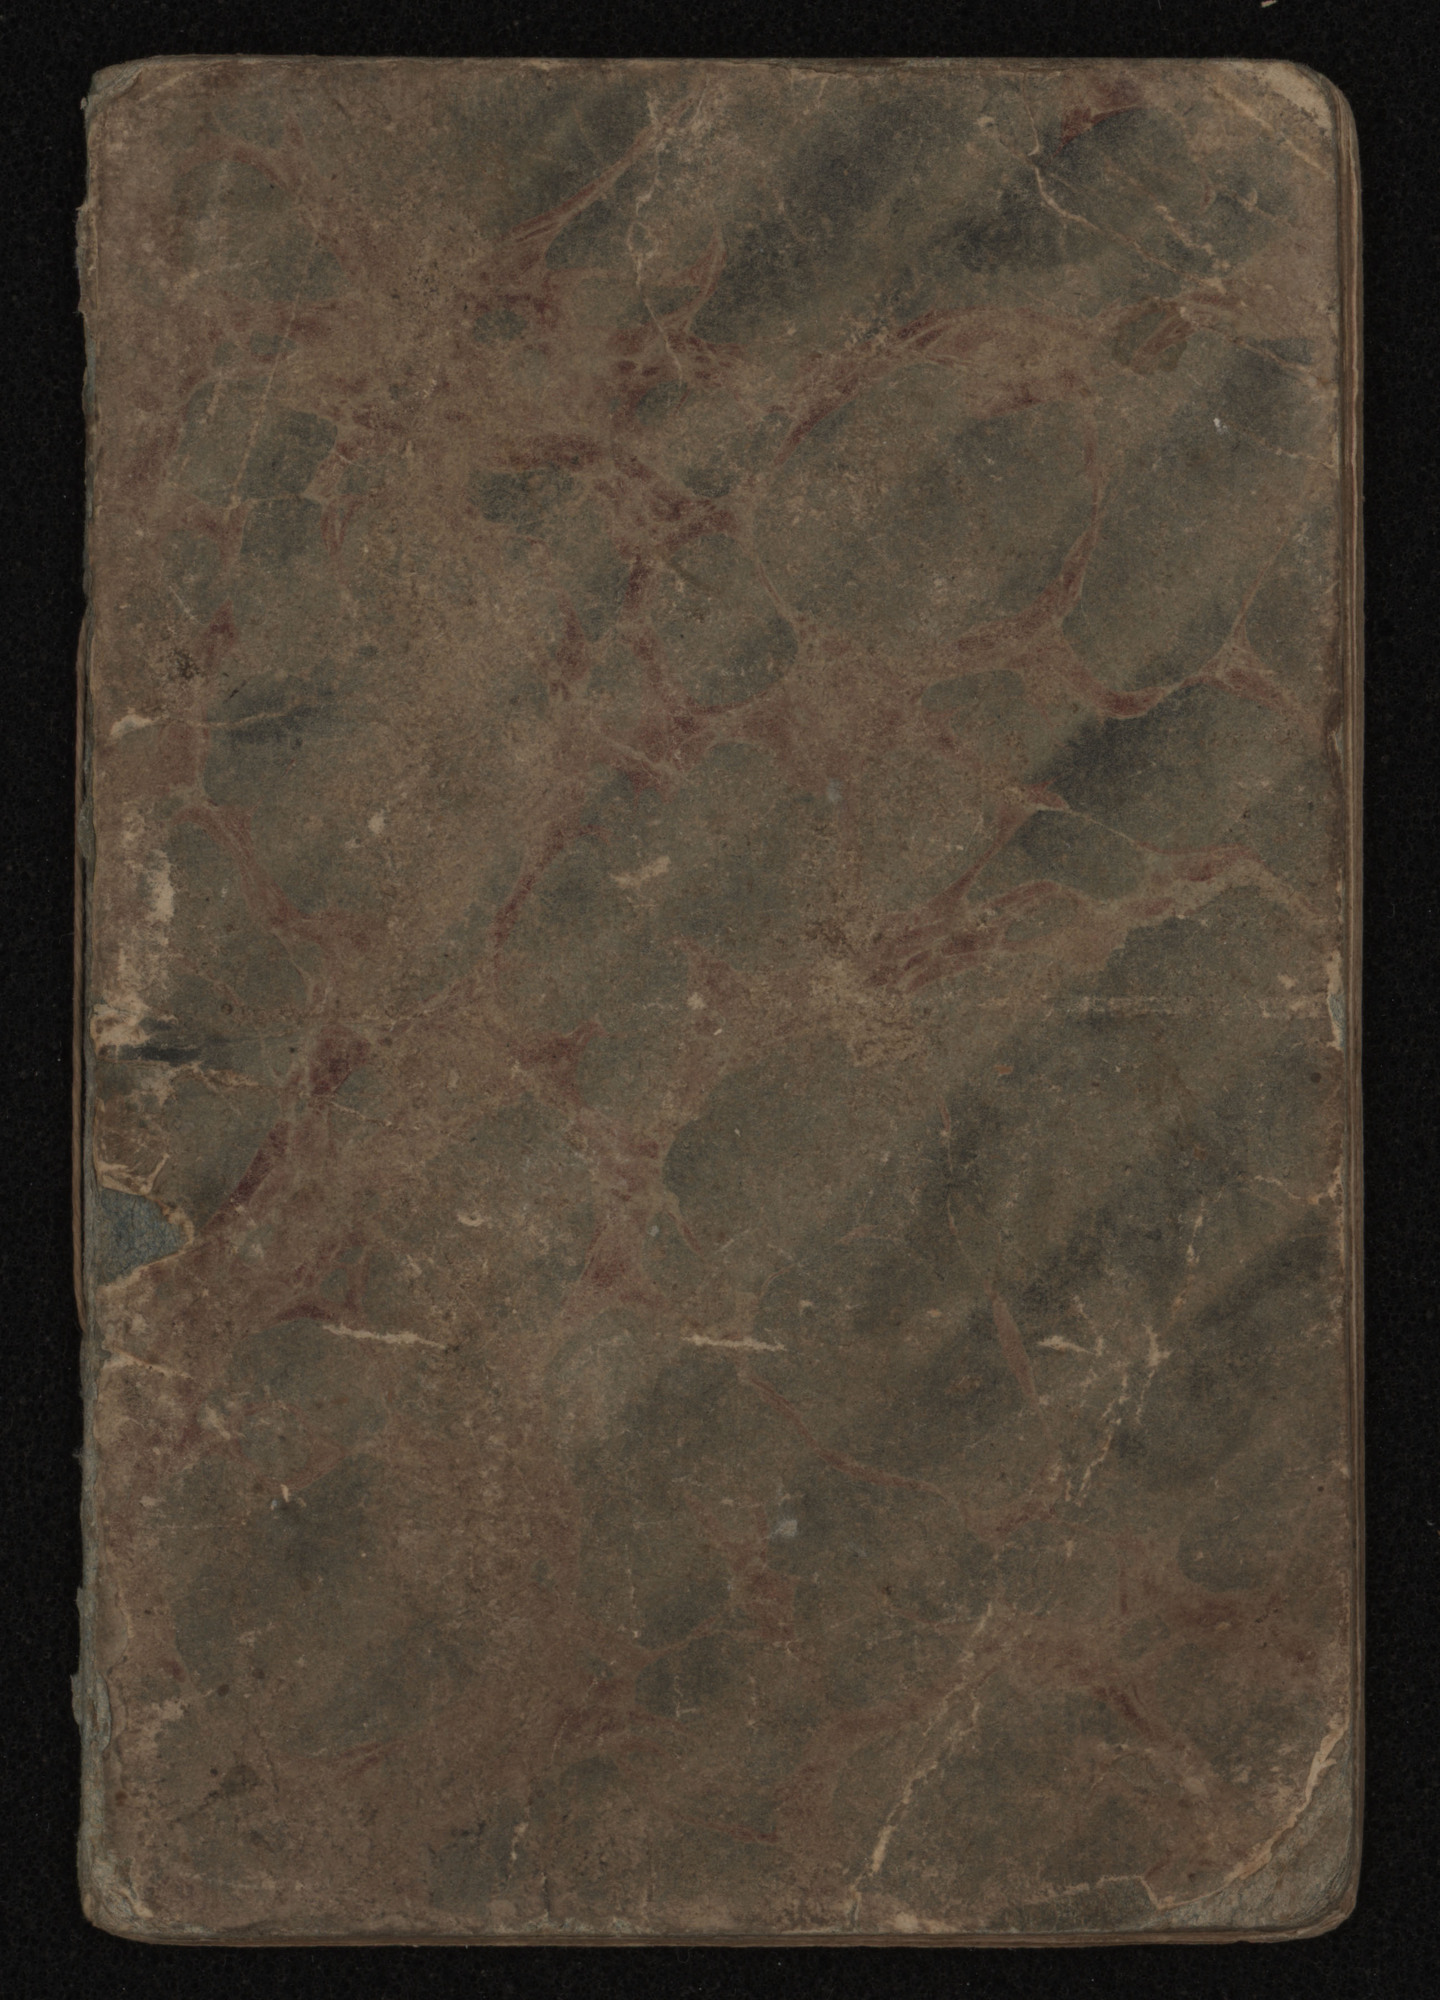 Ms2012-033_M_M_Cottingim_Diary_1862_frontcover.jpg